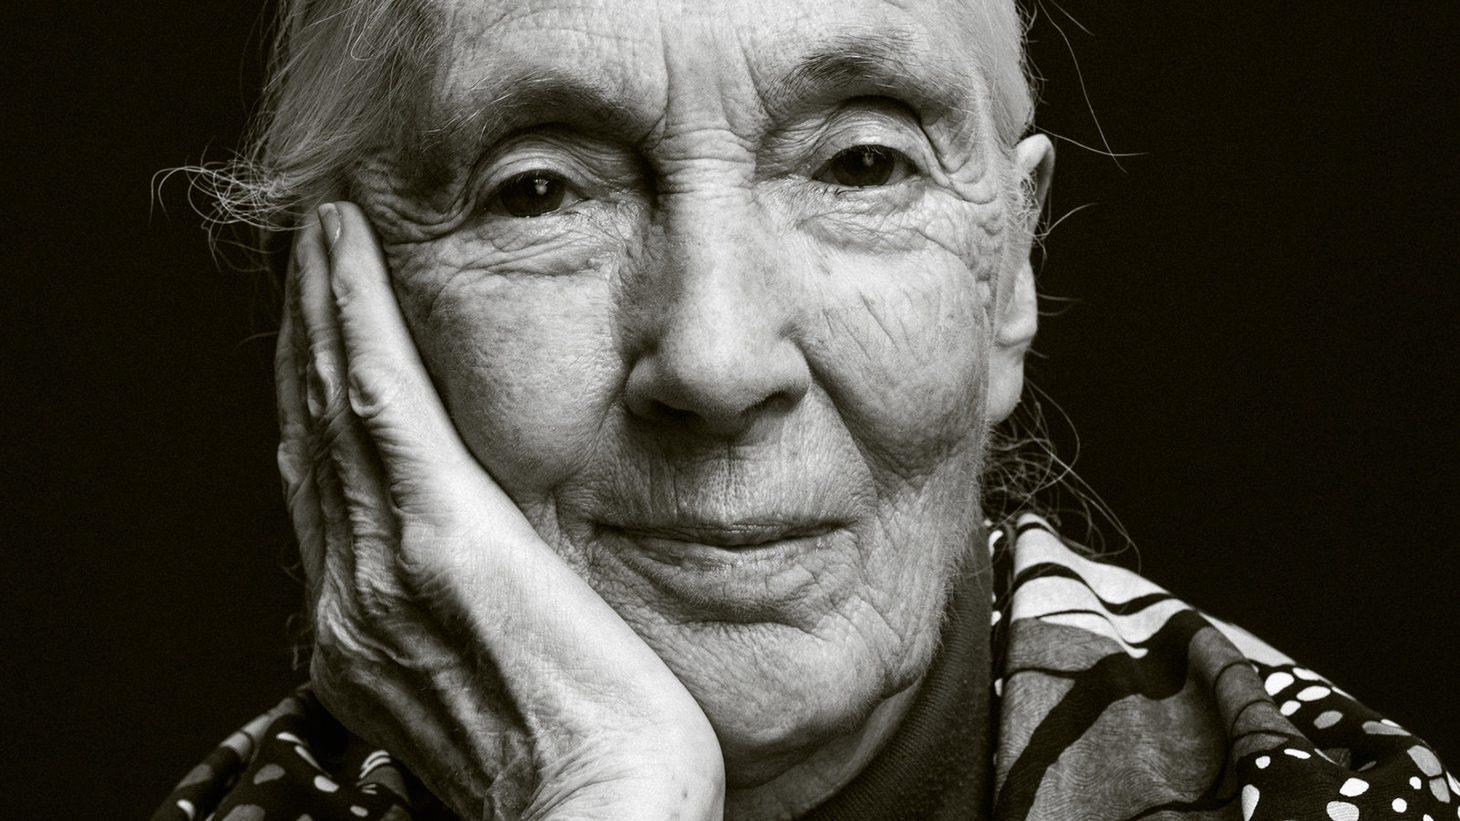 Jane Goodall Women's History Month Round-Up